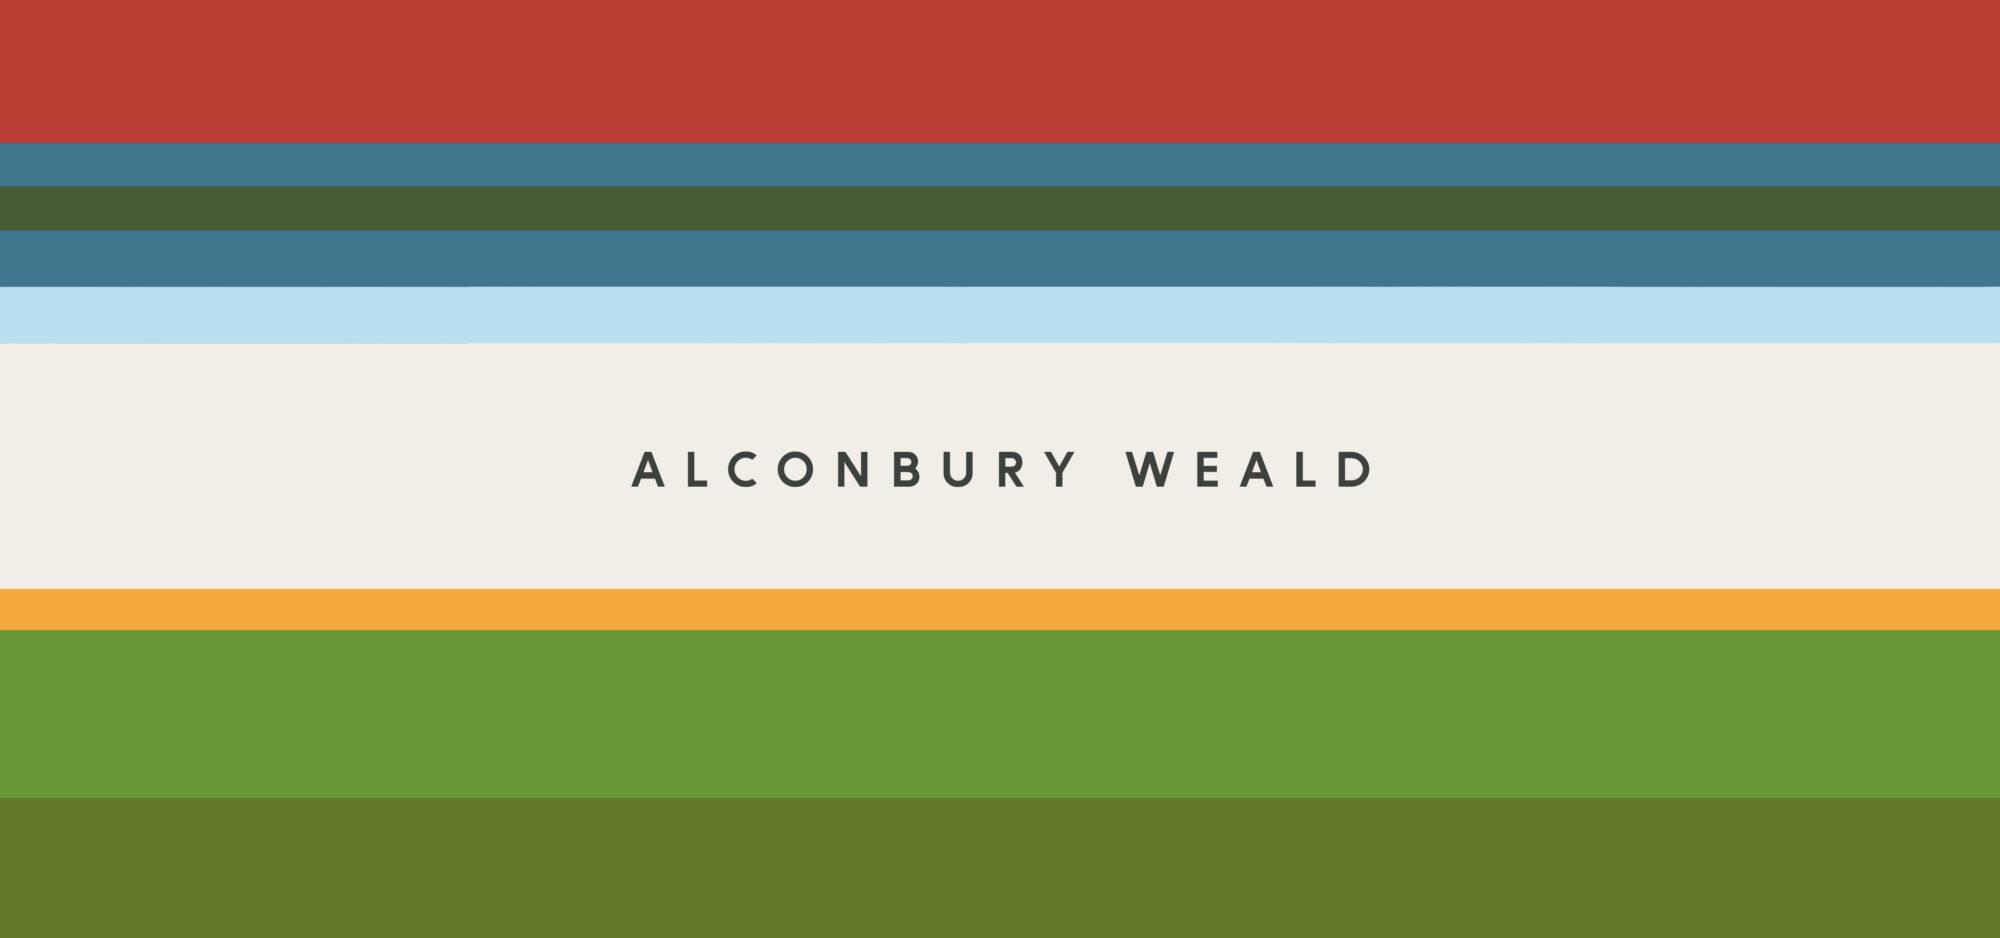 Crest Nicholson Alconbury Weald brandmark logo